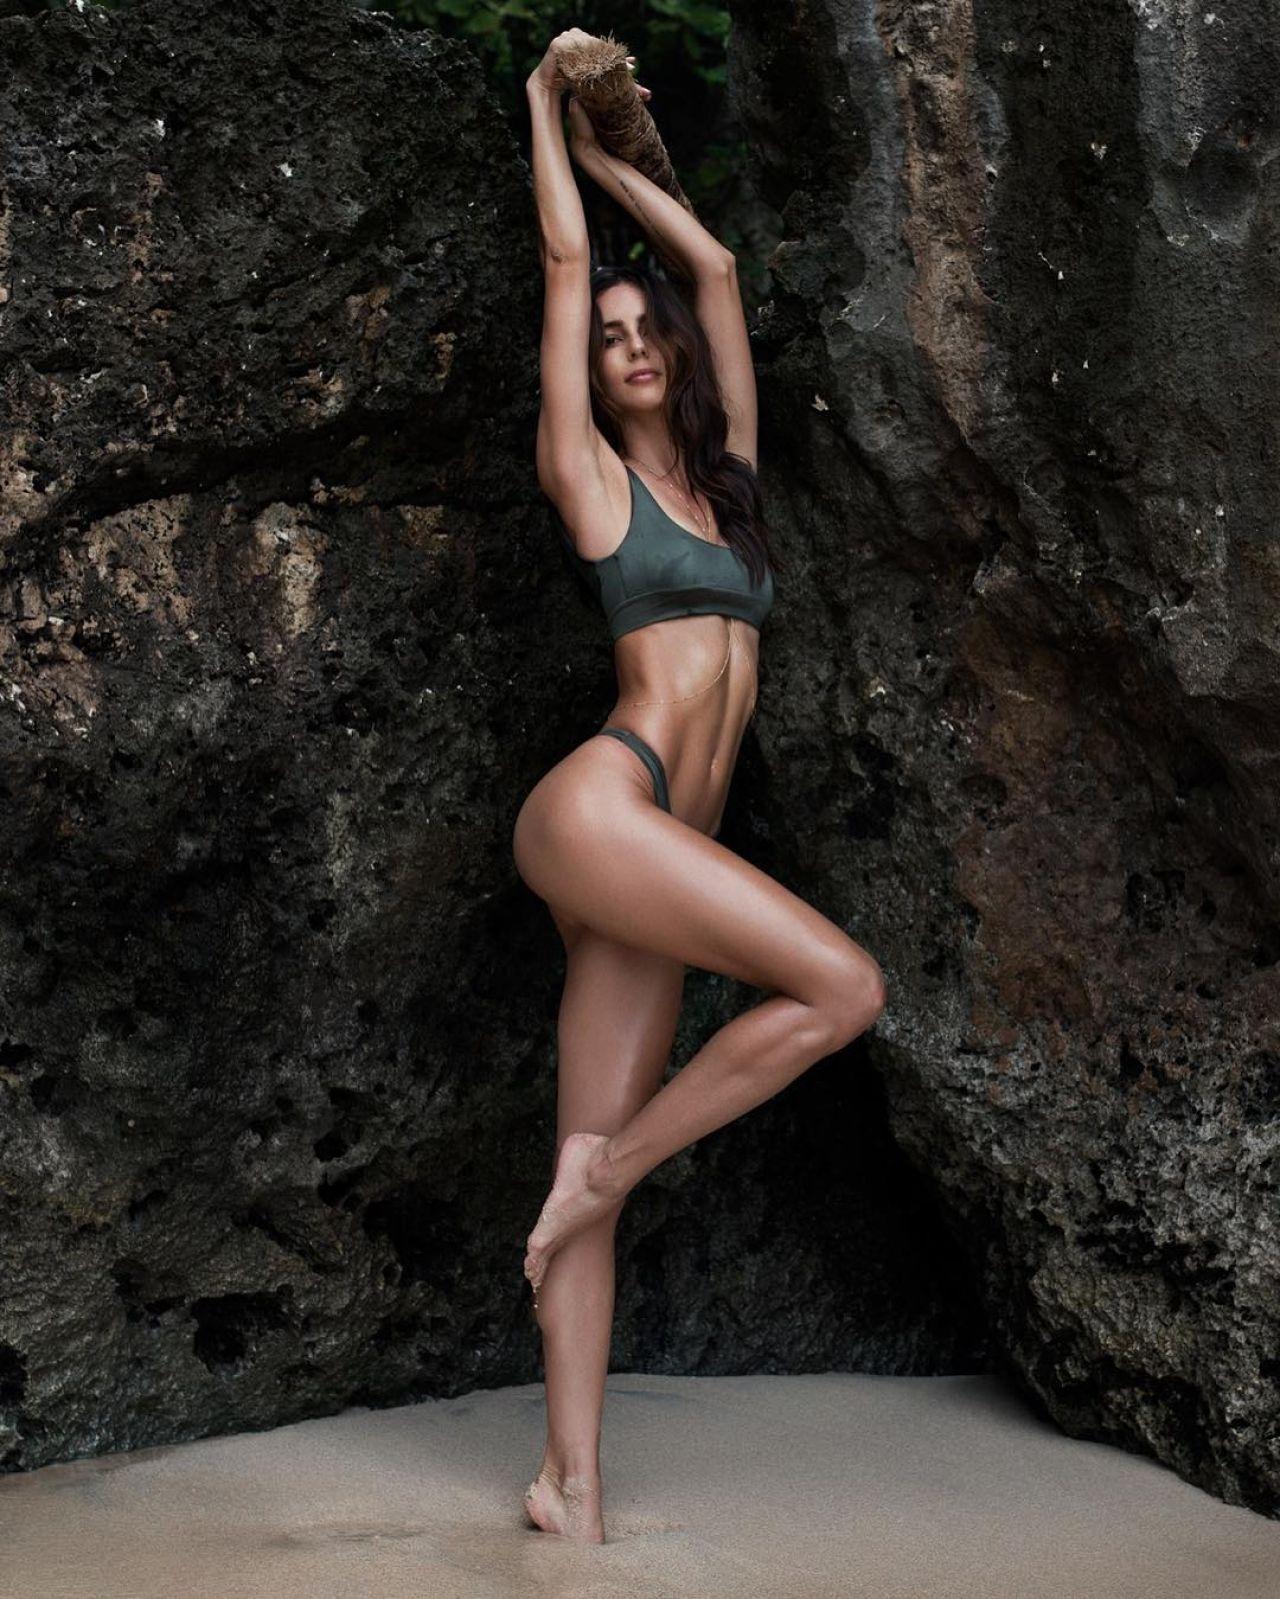 Bikini Amanda Pizziconi nude (68 foto and video), Ass, Sideboobs, Selfie, swimsuit 2020